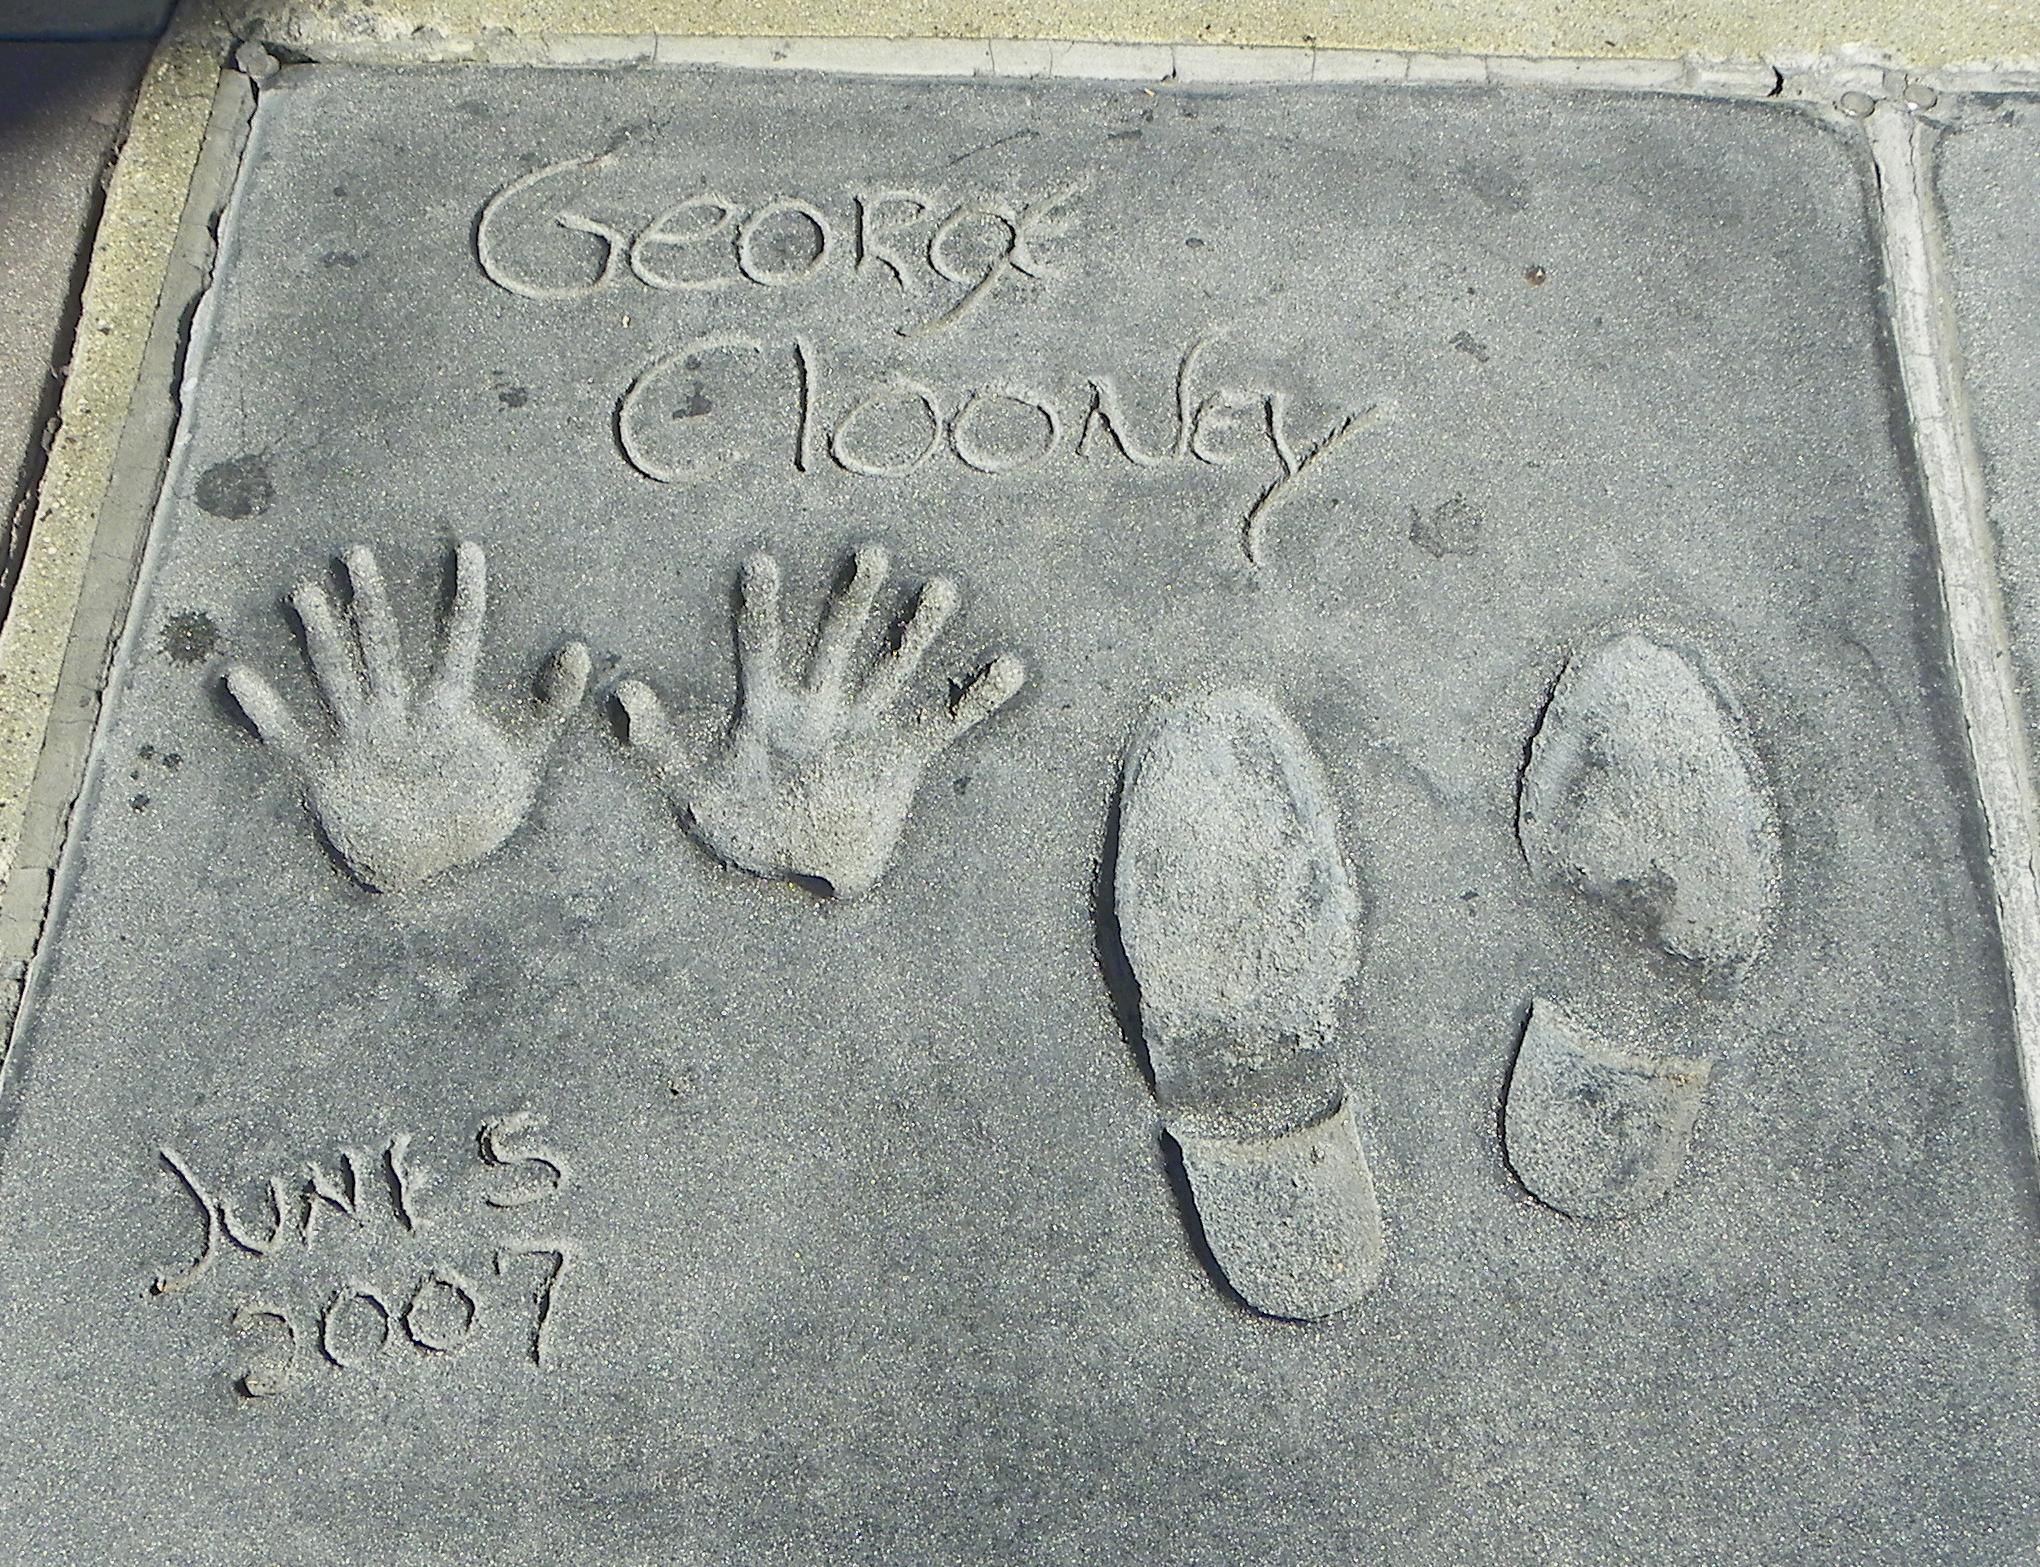 File:GeorgeClooneyGraumanHandFootprintsOct10.jpg - Wikimedia Commons